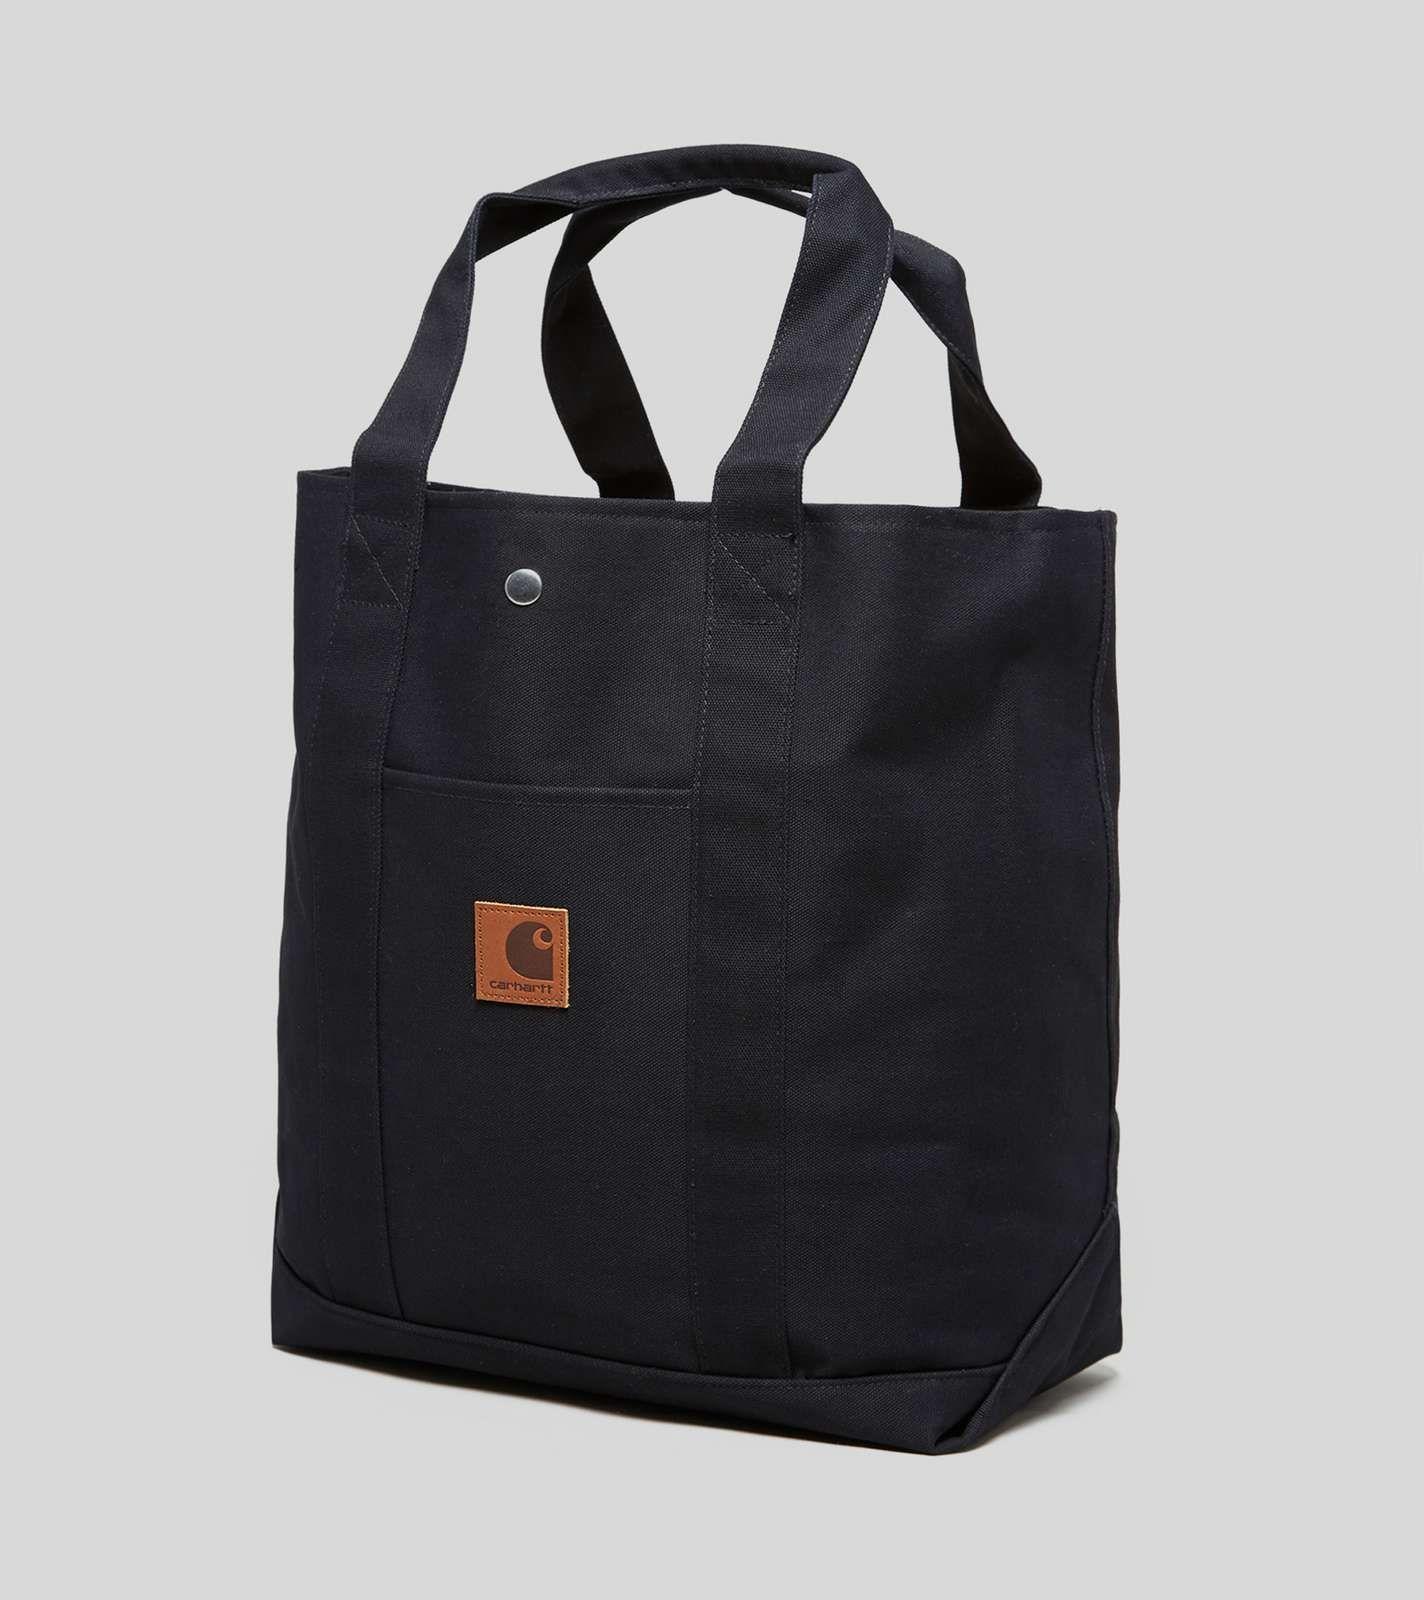 c23a90c571d Carhartt WIP Simple Tote Bag | Size? #Mensaccessories | Mens ...